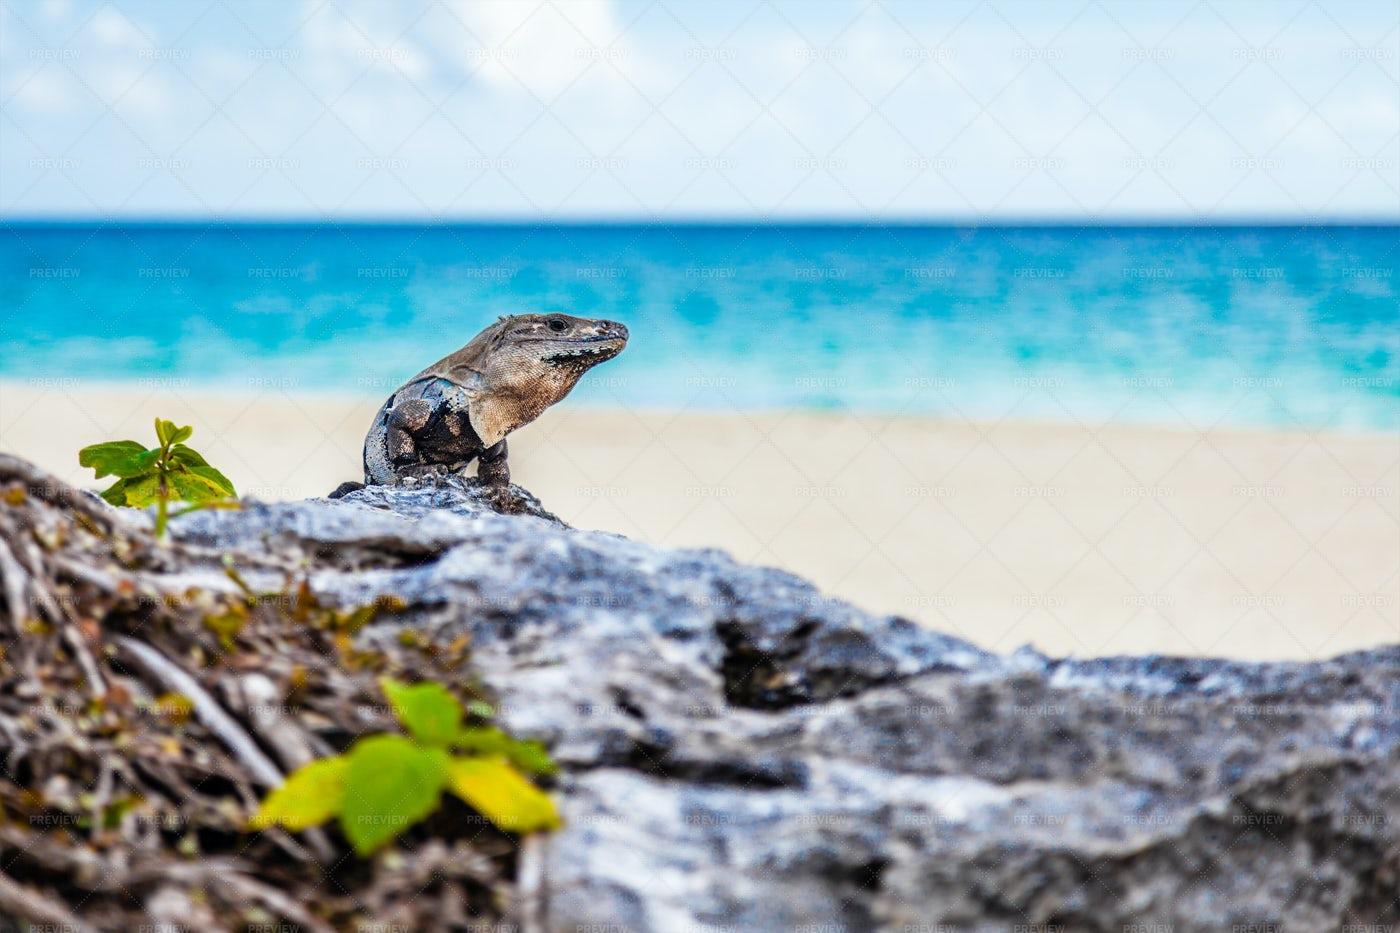 Iguana Basking On Beach: Stock Photos